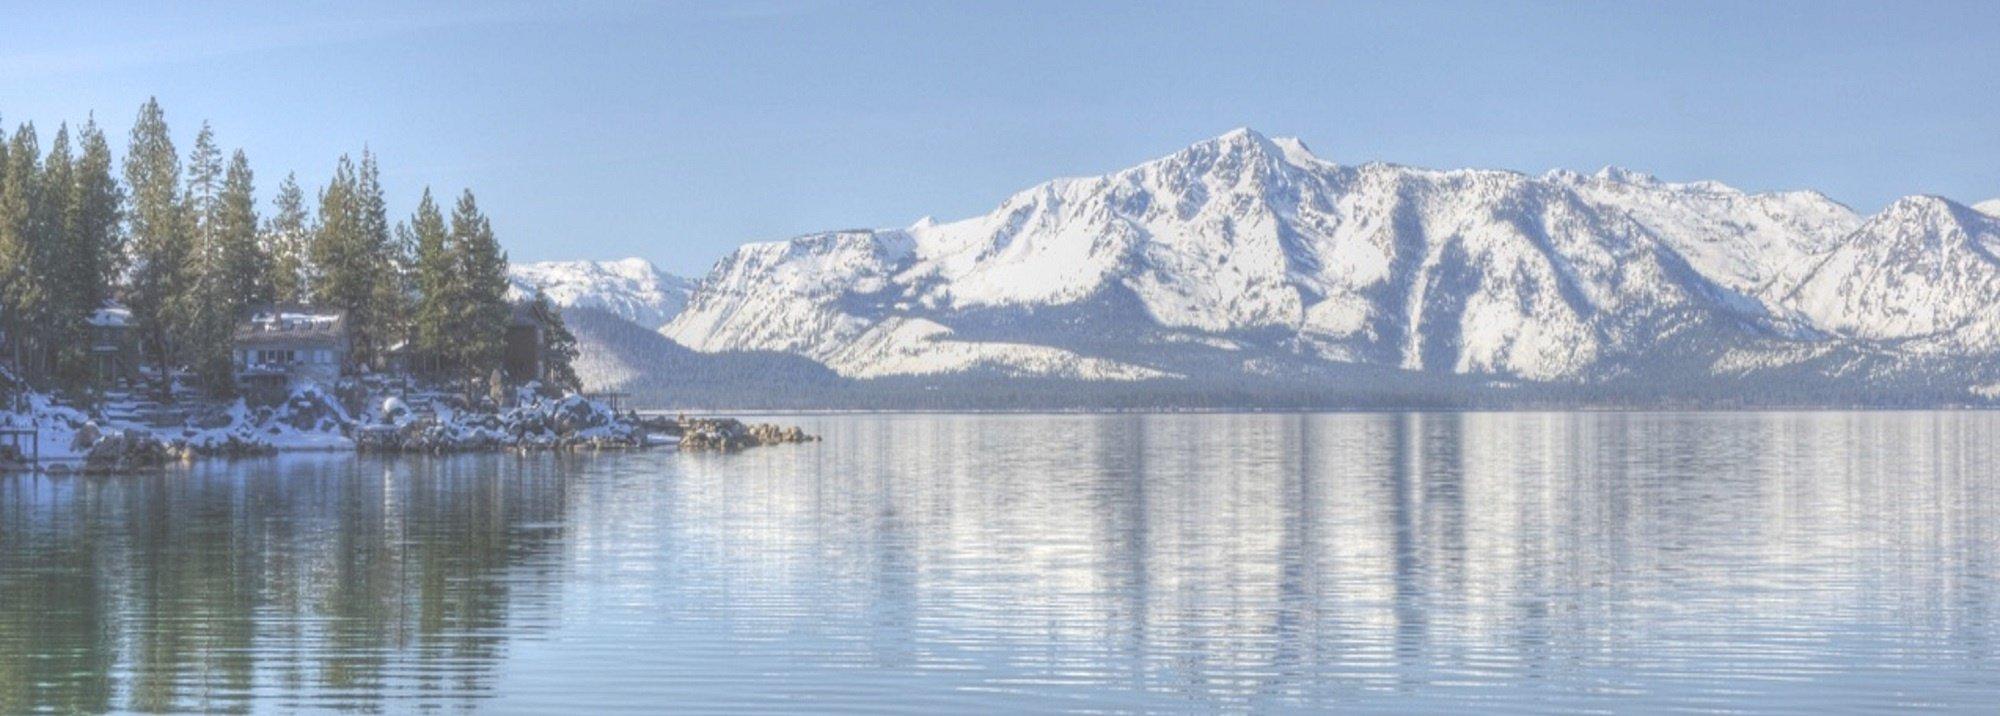 banner-data-lake2.jpg